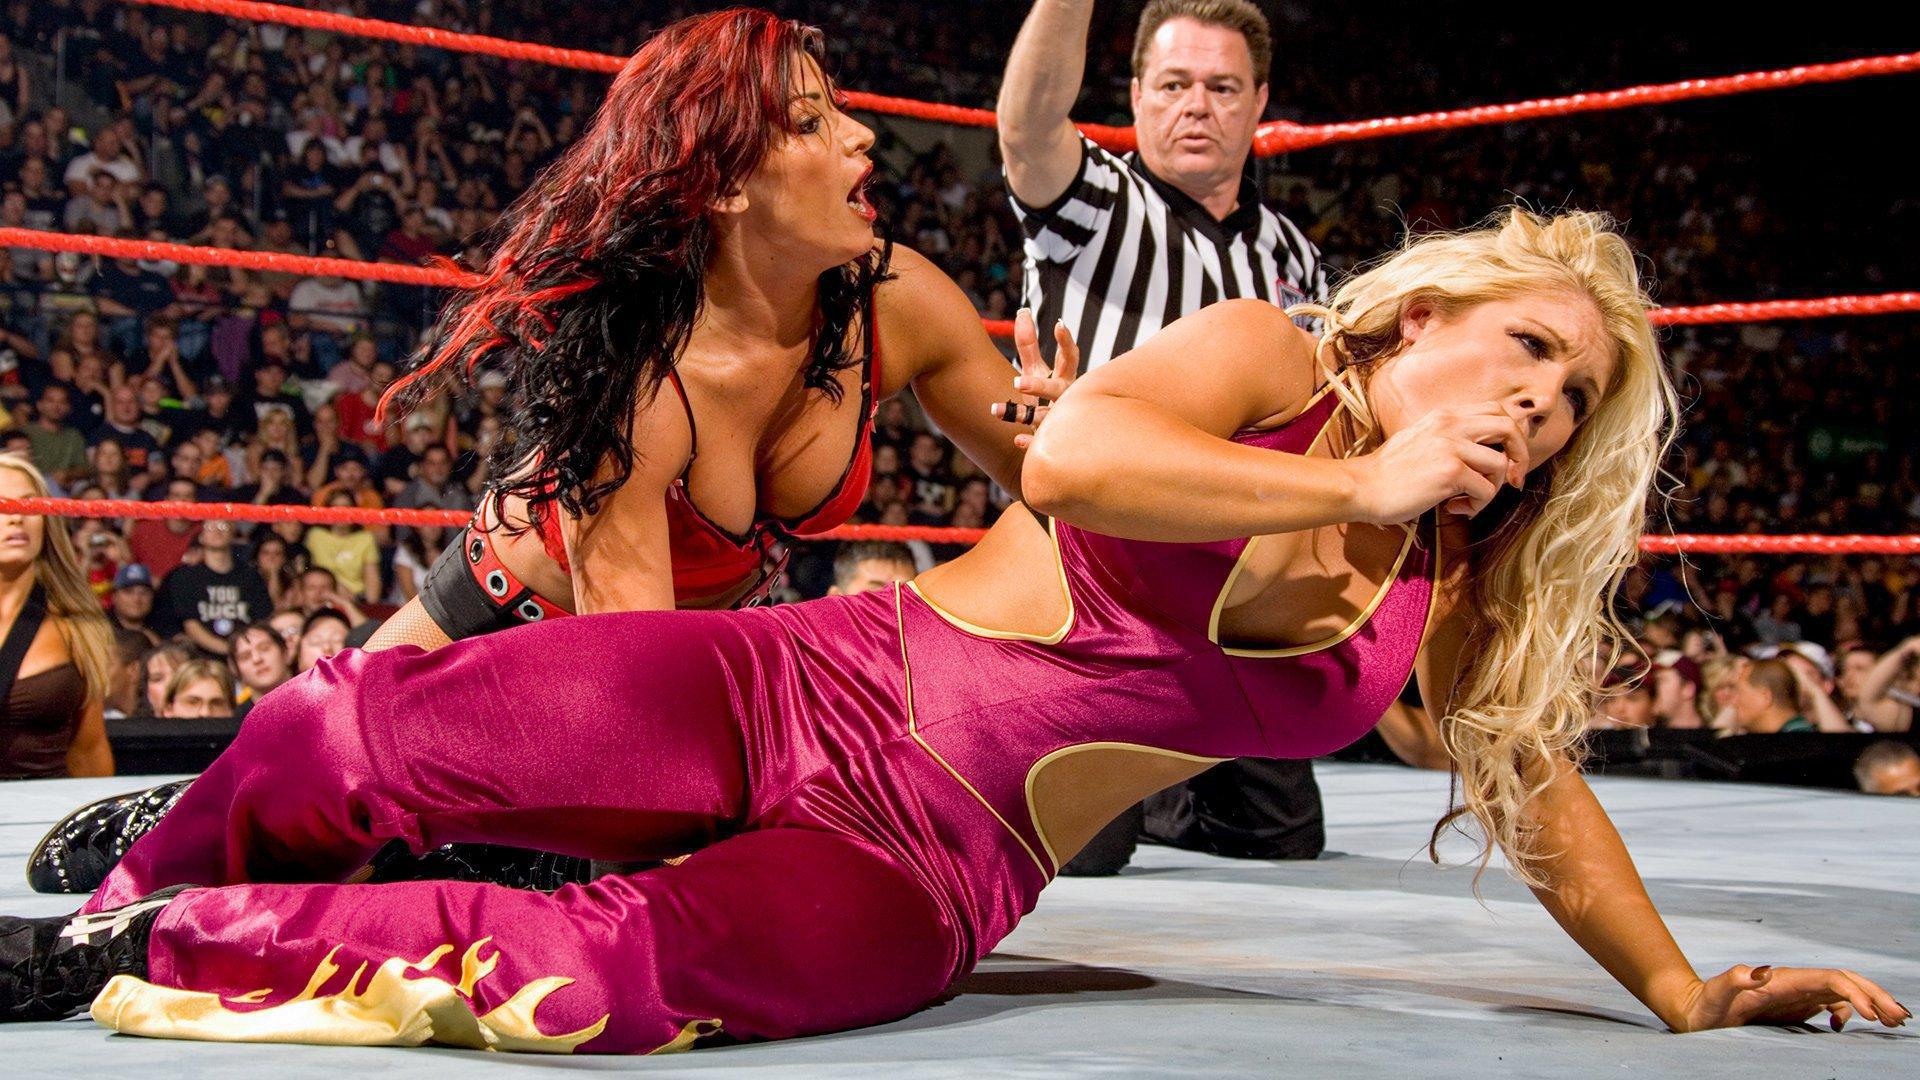 Girls wrestling sexy Julia vs